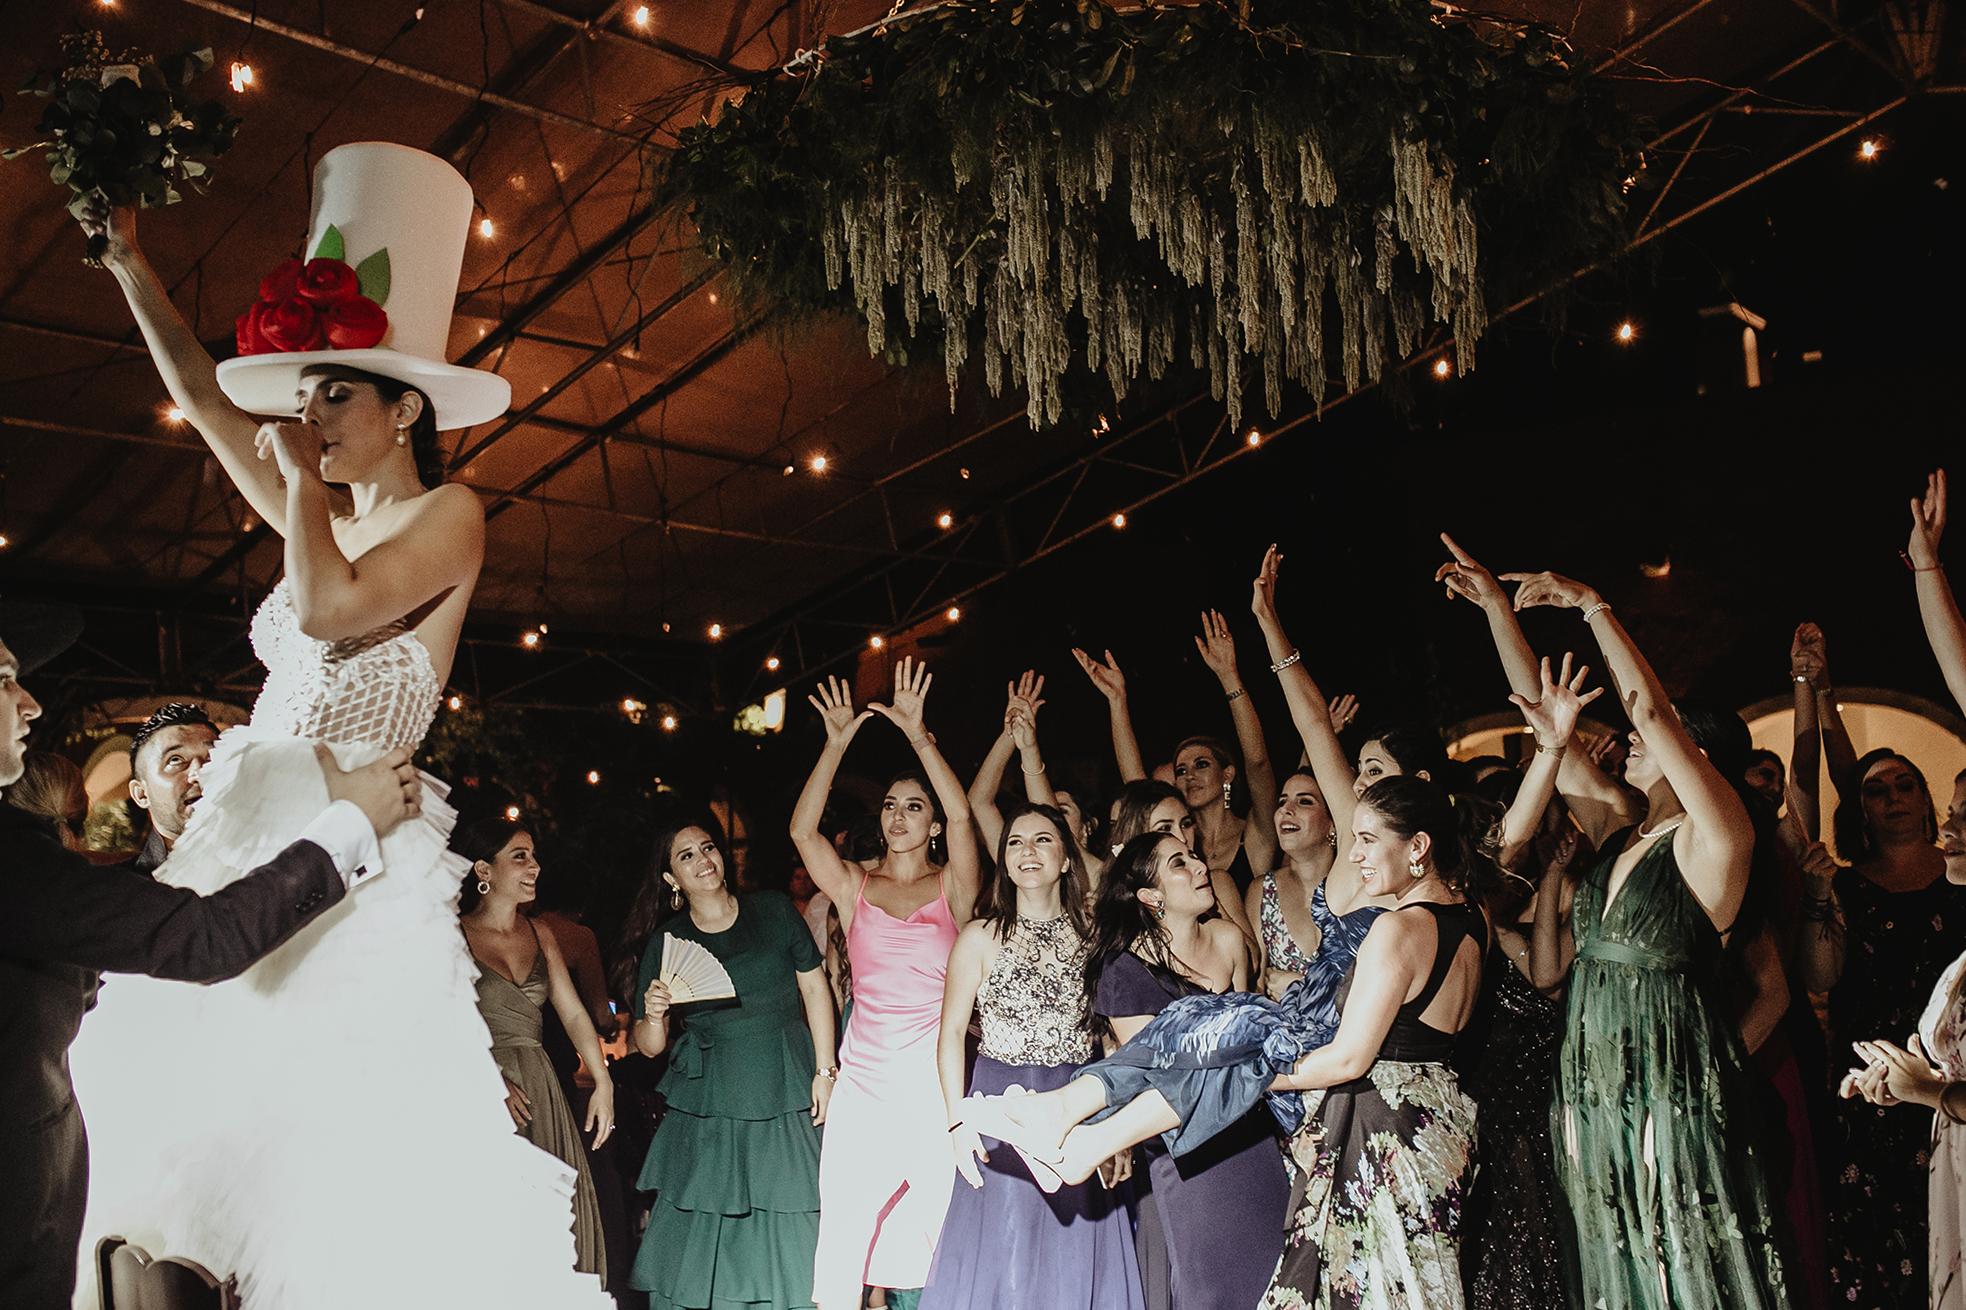 1357R&F__WeddingDestination_Weddingmerida_BodaMexico_FotografoDeBodas_FabrizioSimoneenFotografo.jpg